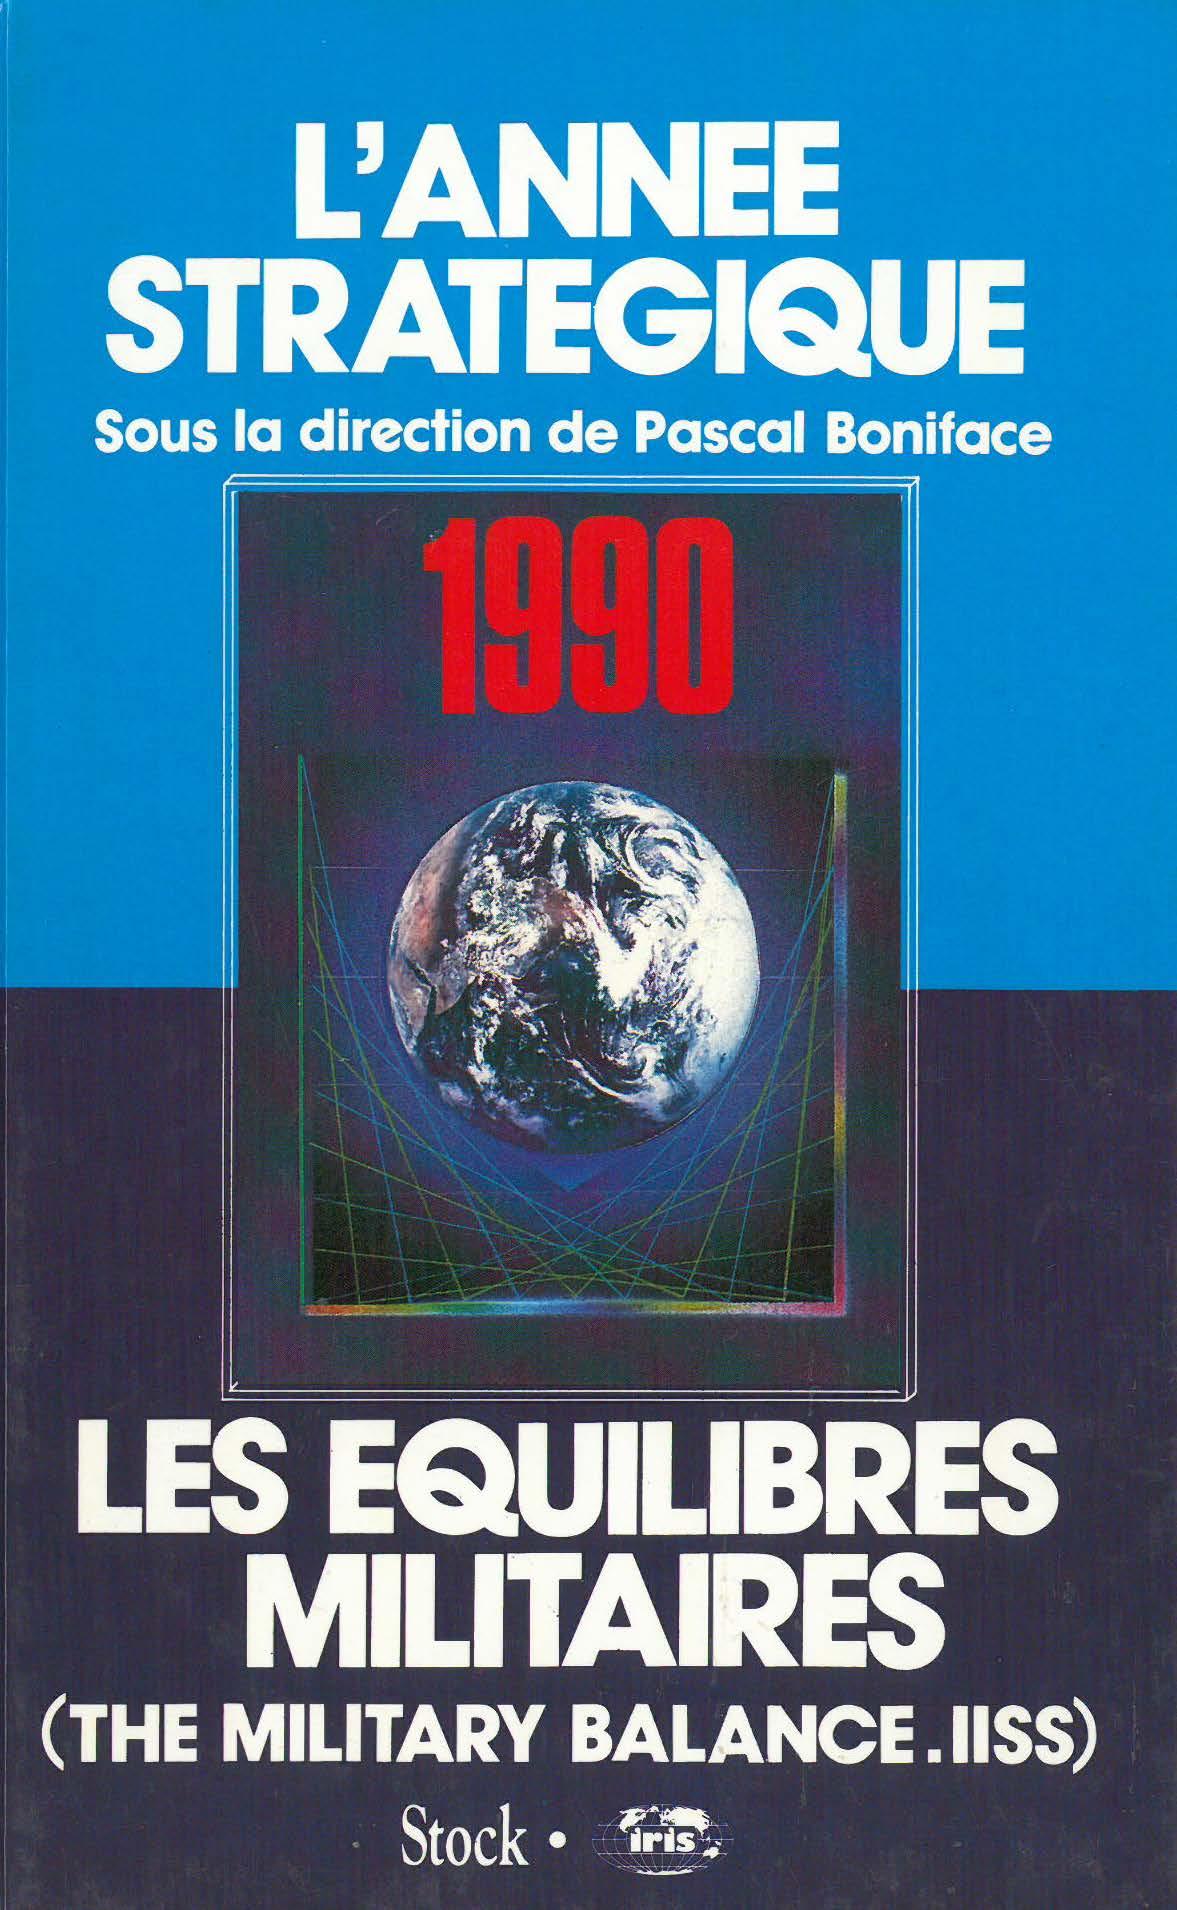 As 1990